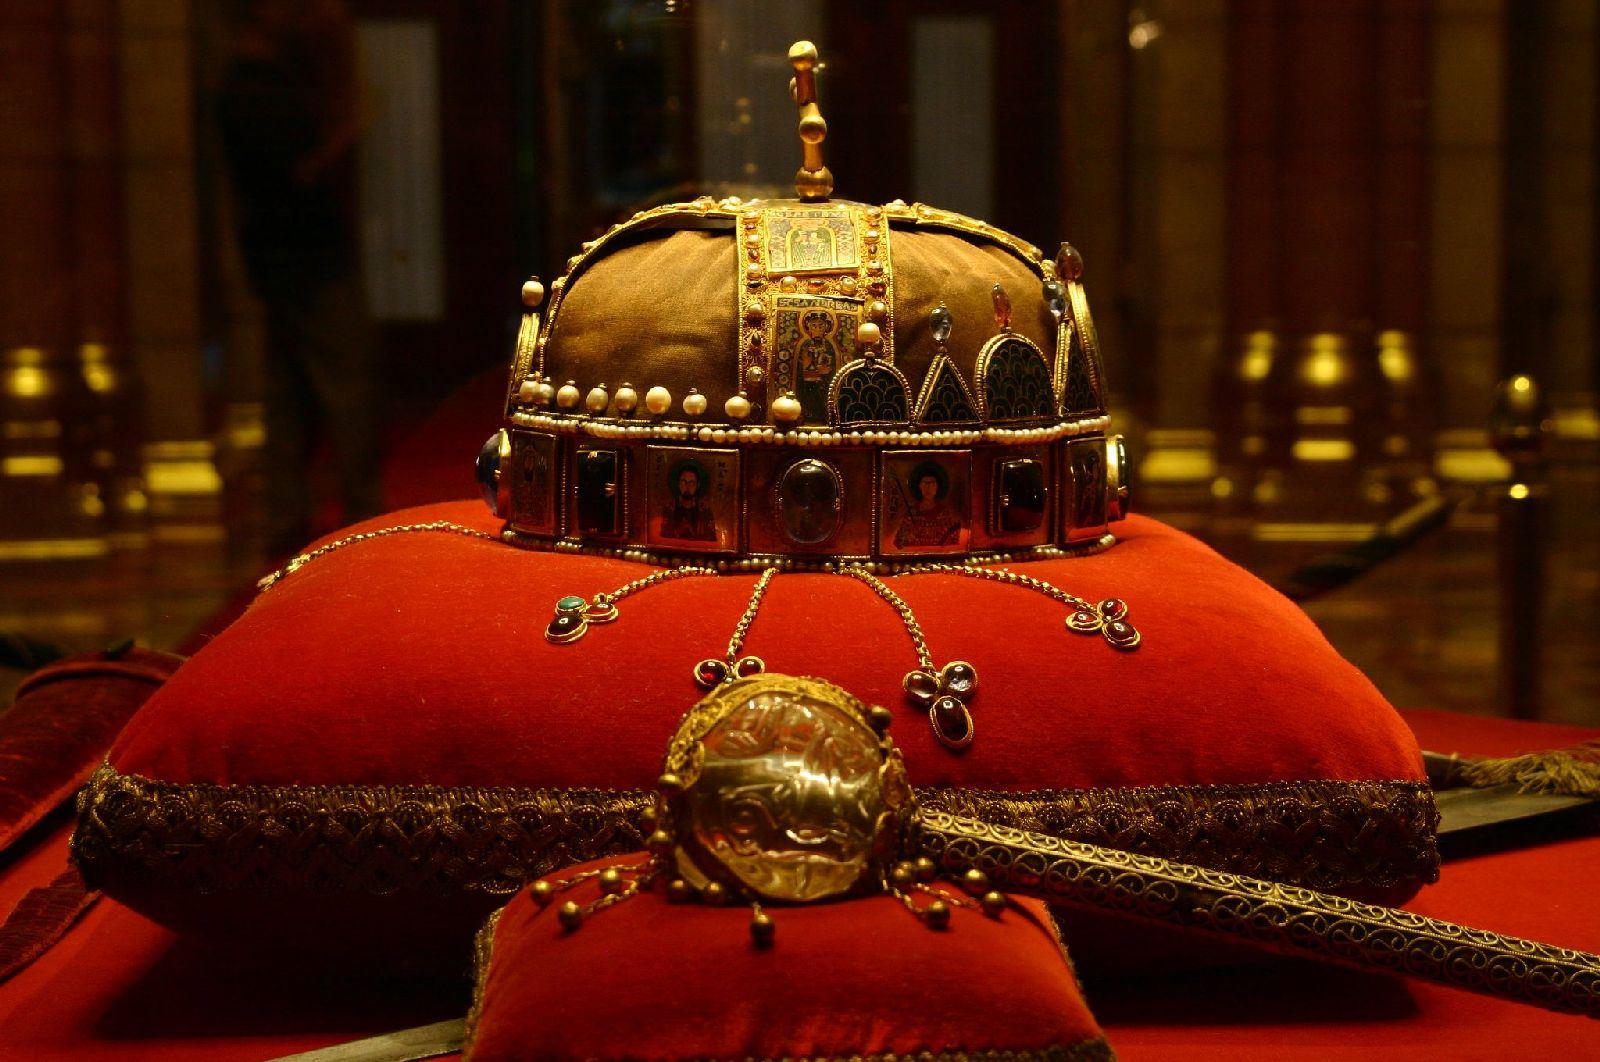 budapest parliament crown